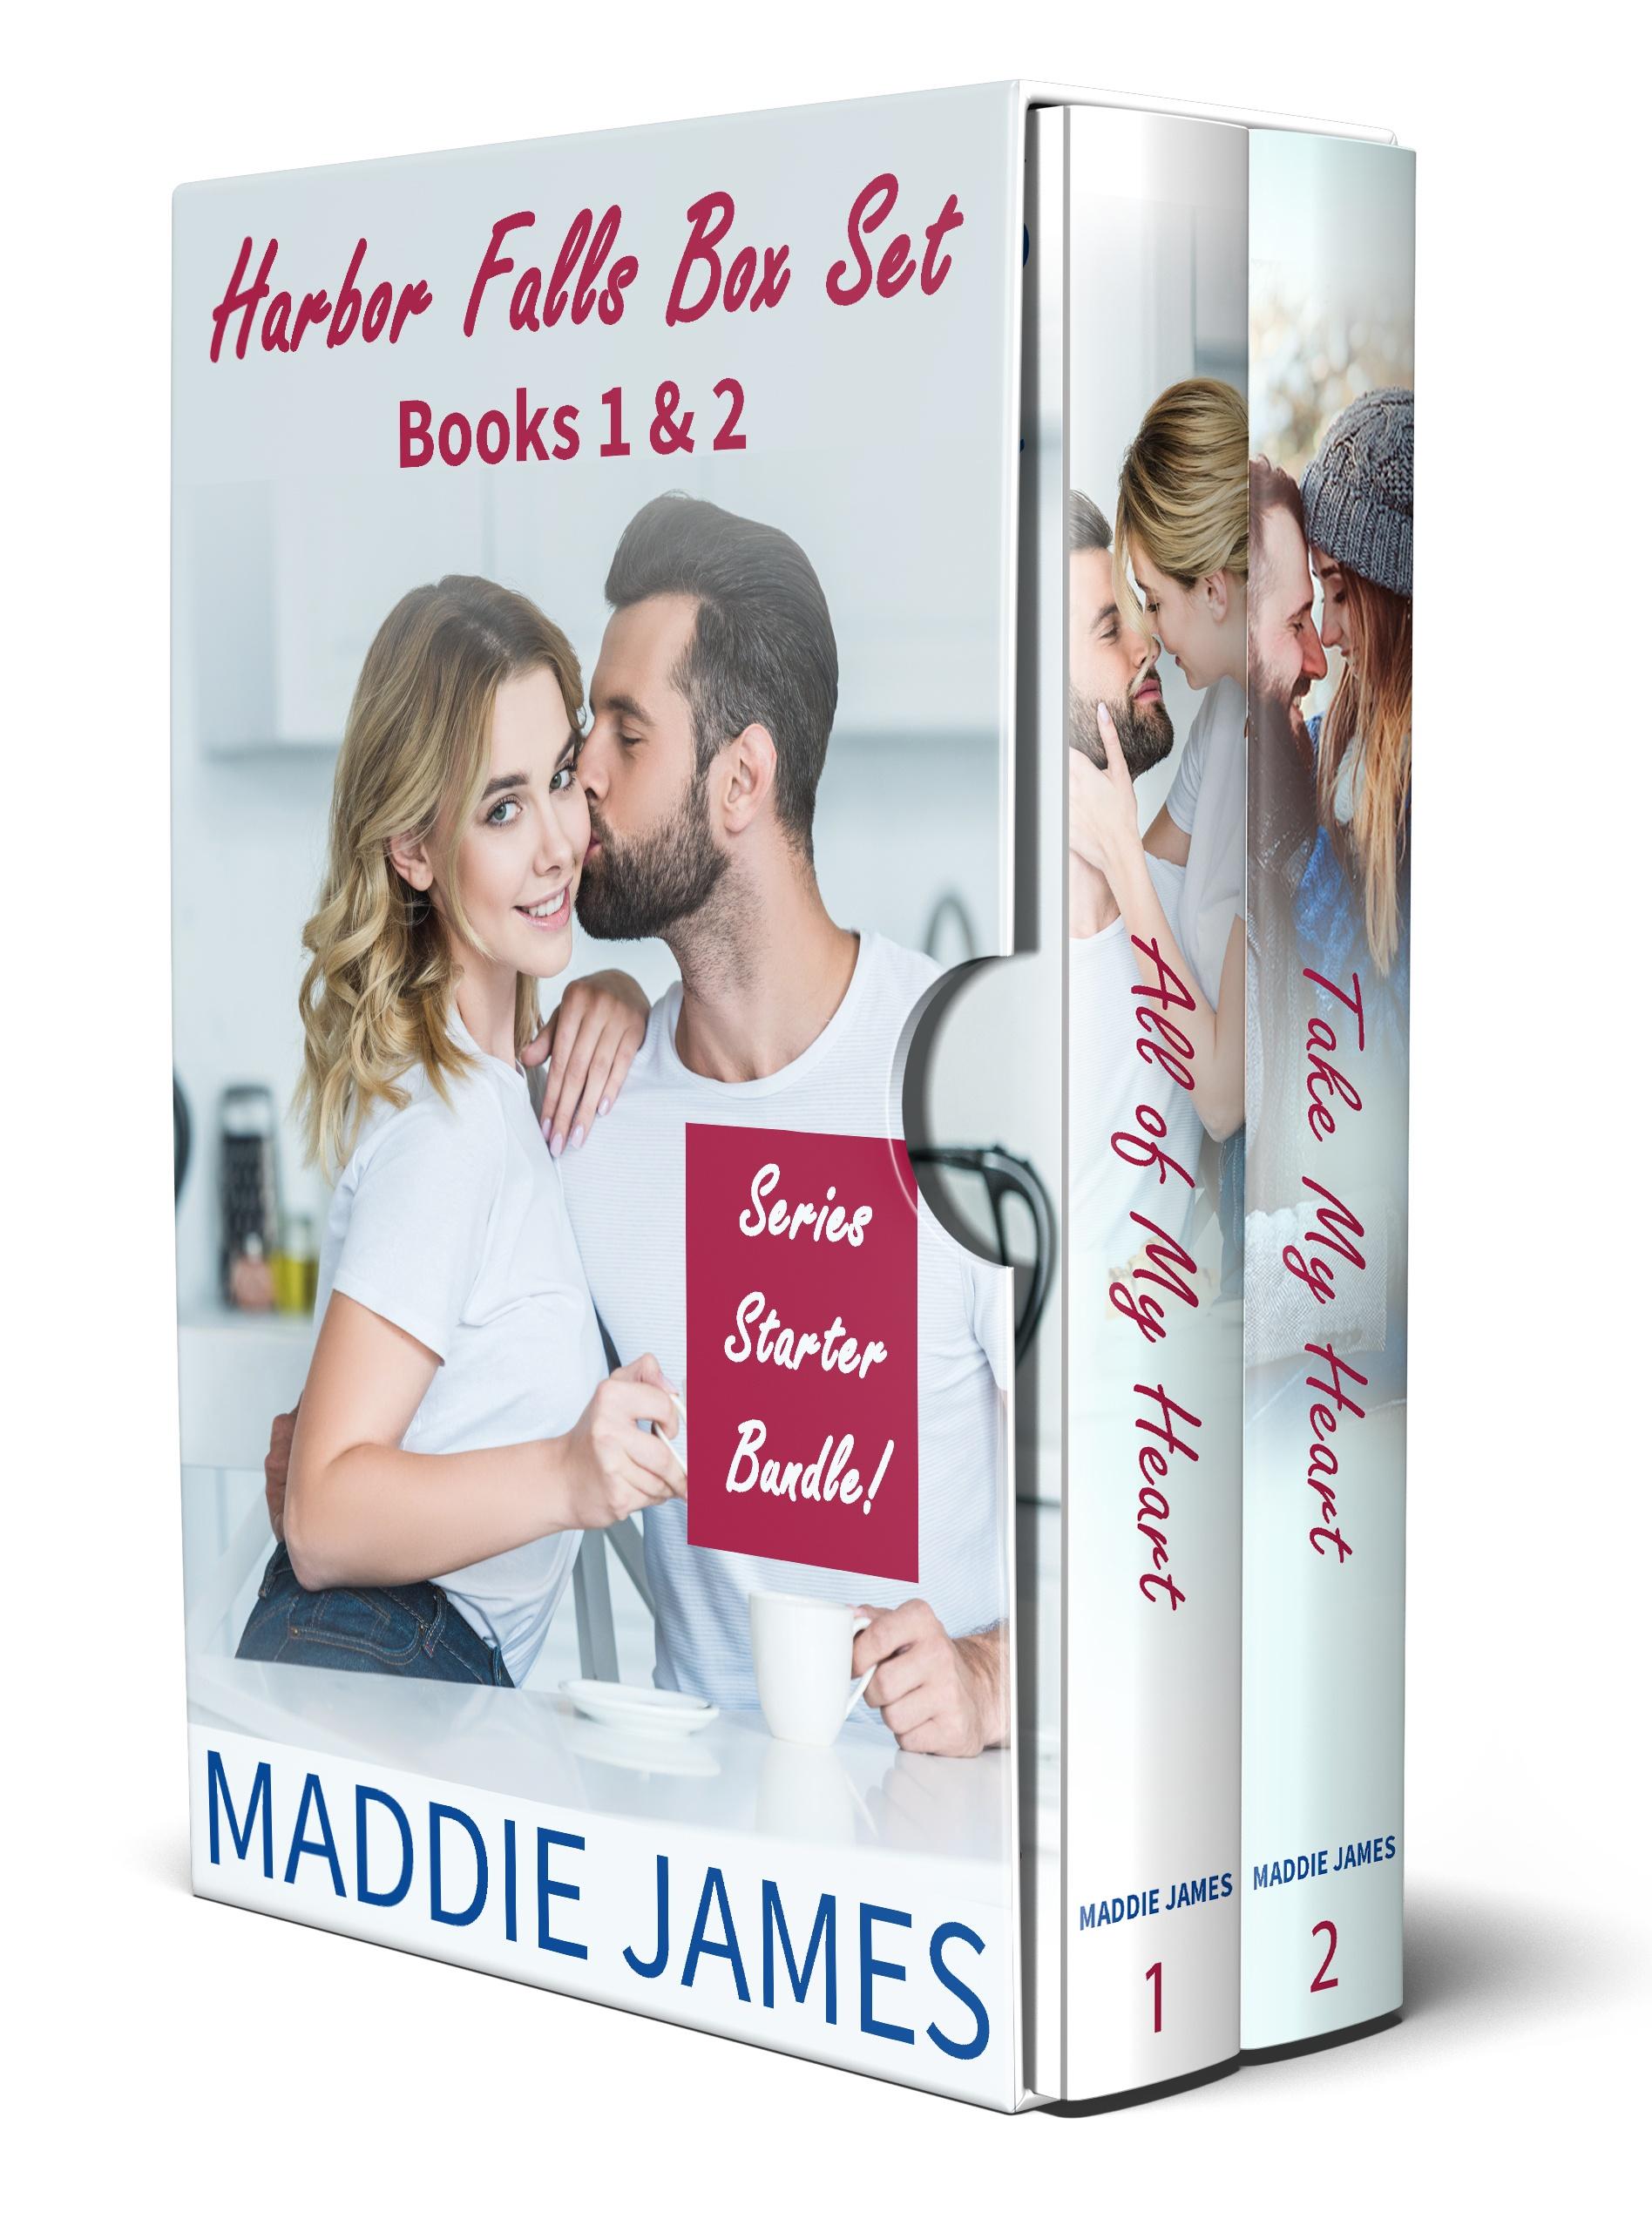 HF-Books-1-and-2-Box-Set-cover.jpg